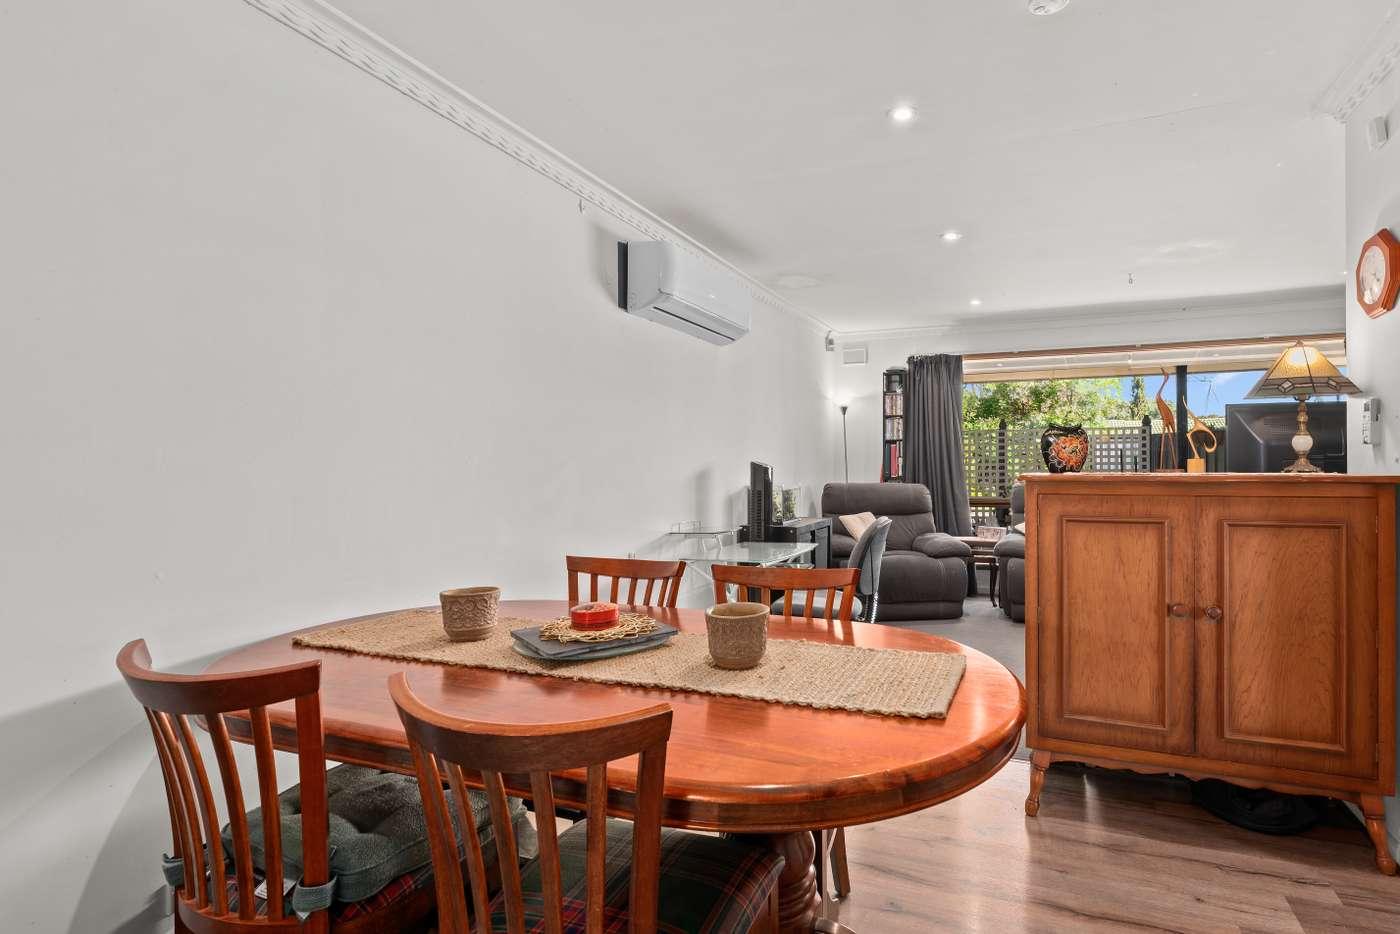 Fifth view of Homely house listing, 15 Hinkley Road, Morphett Vale SA 5162